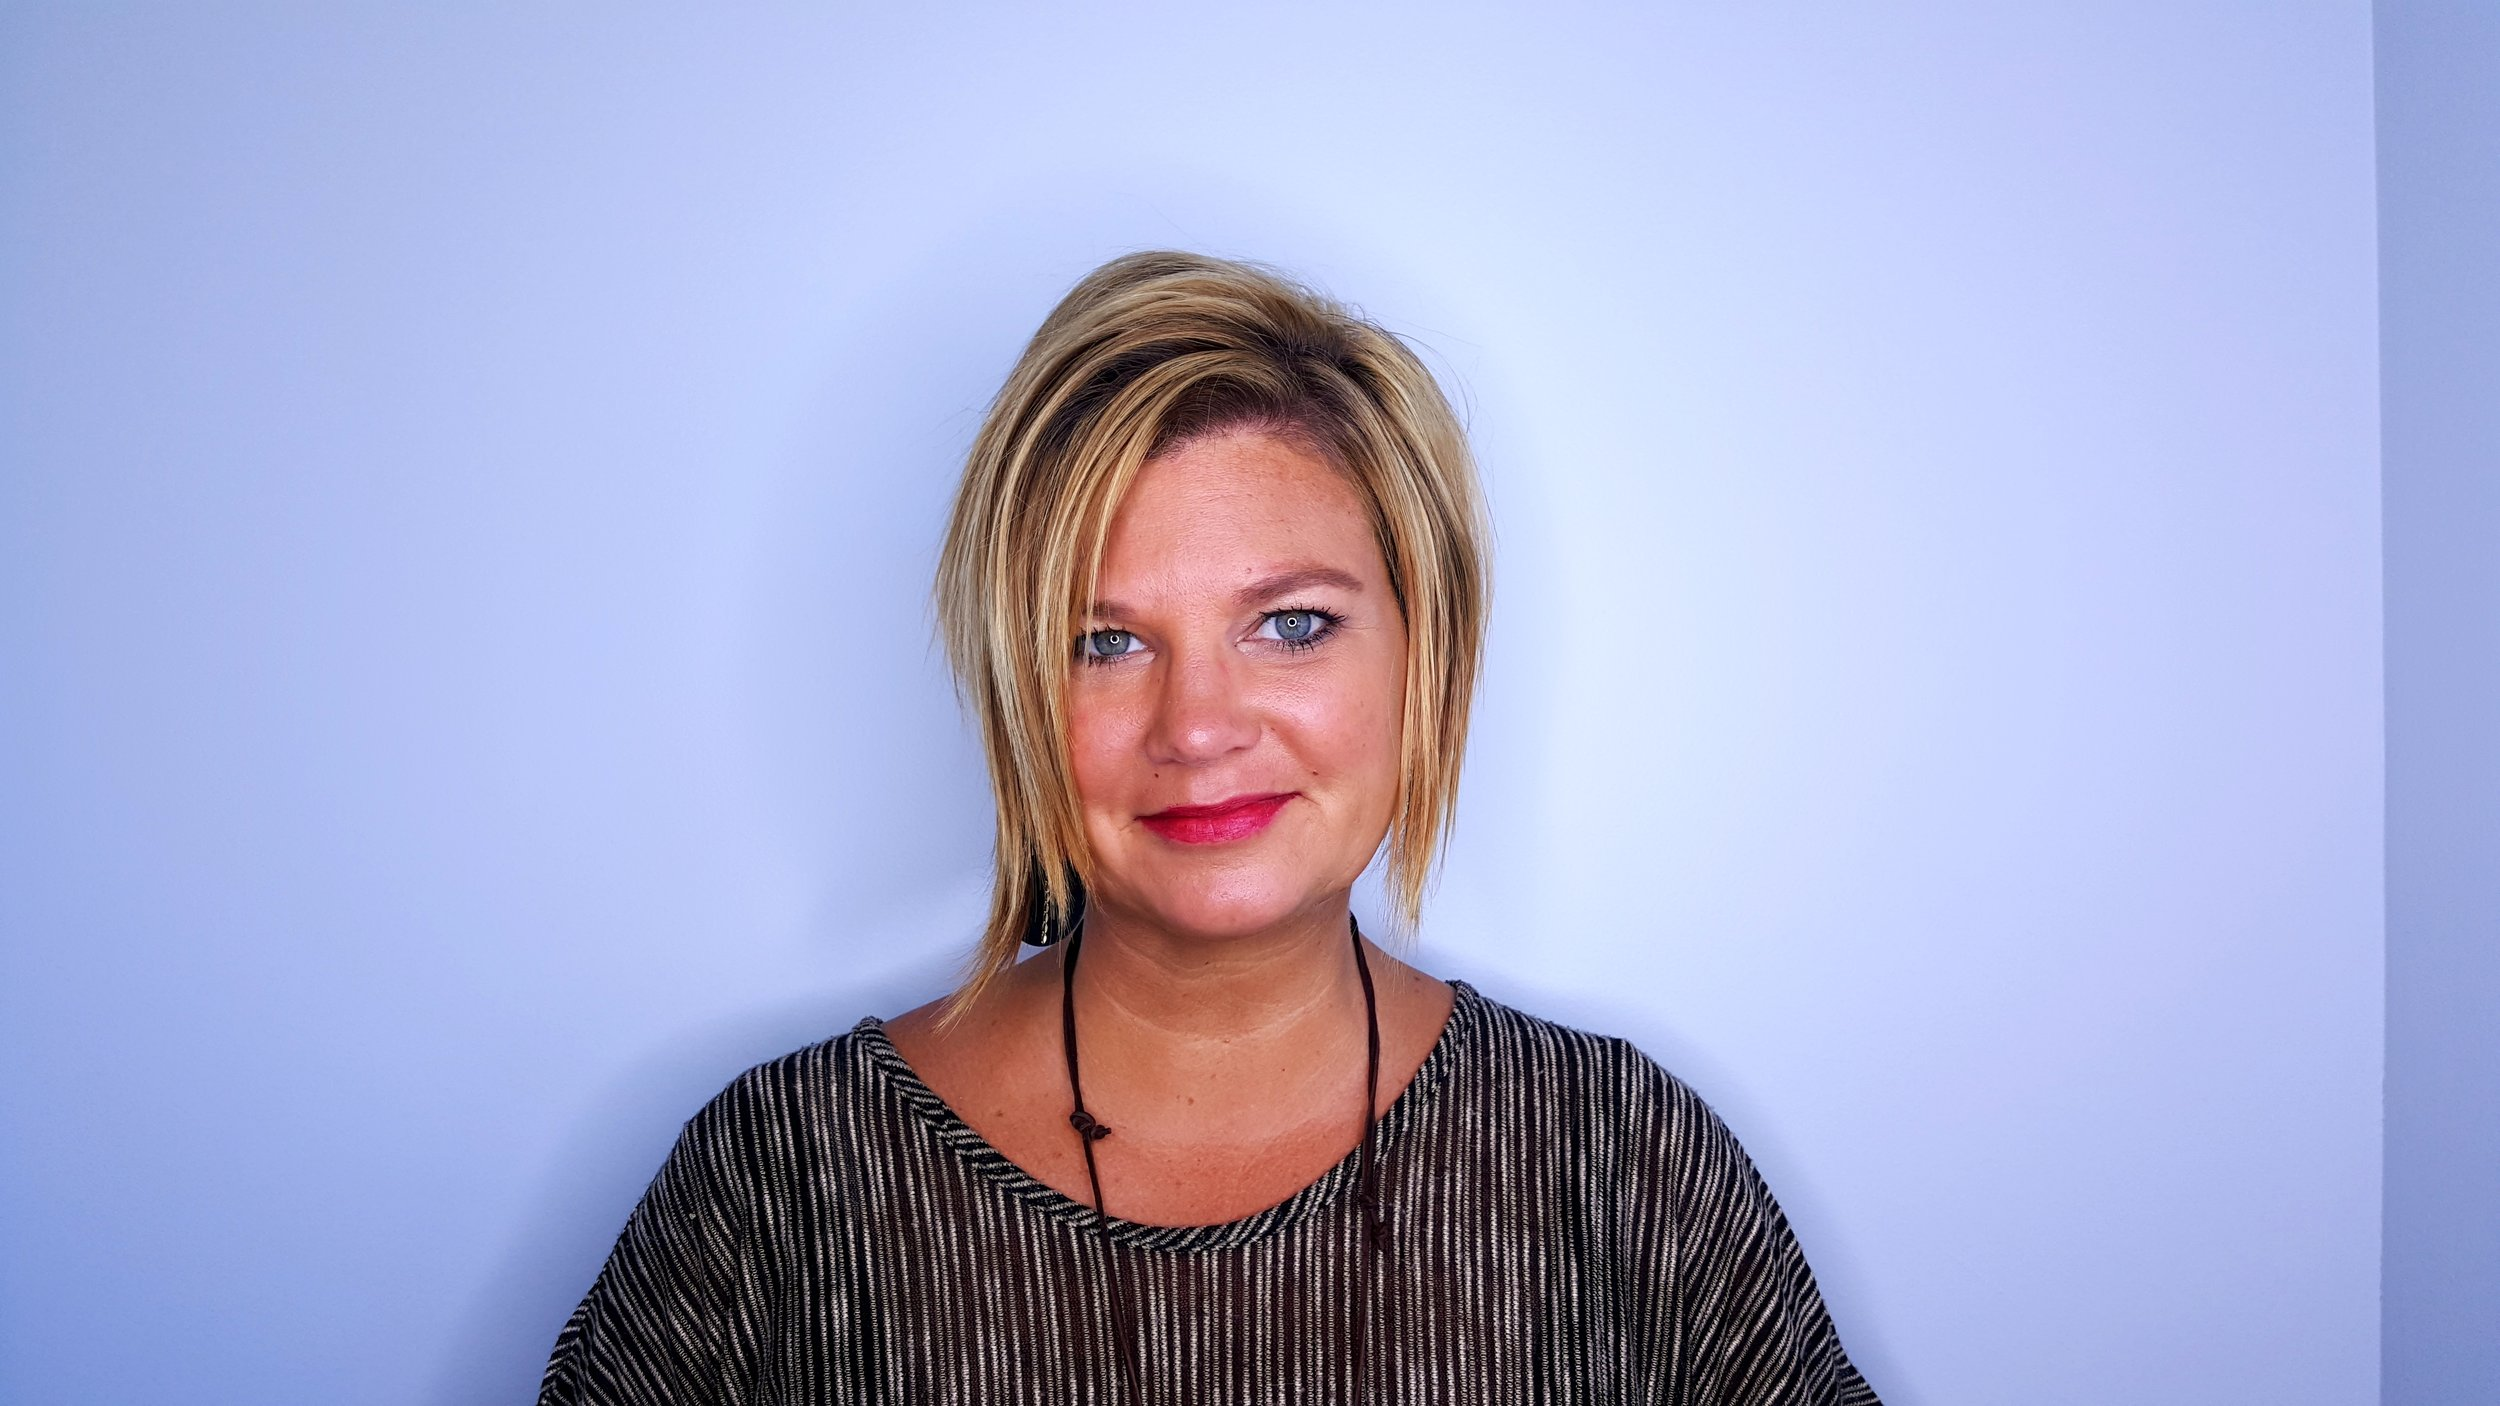 Jayna Vandenberg